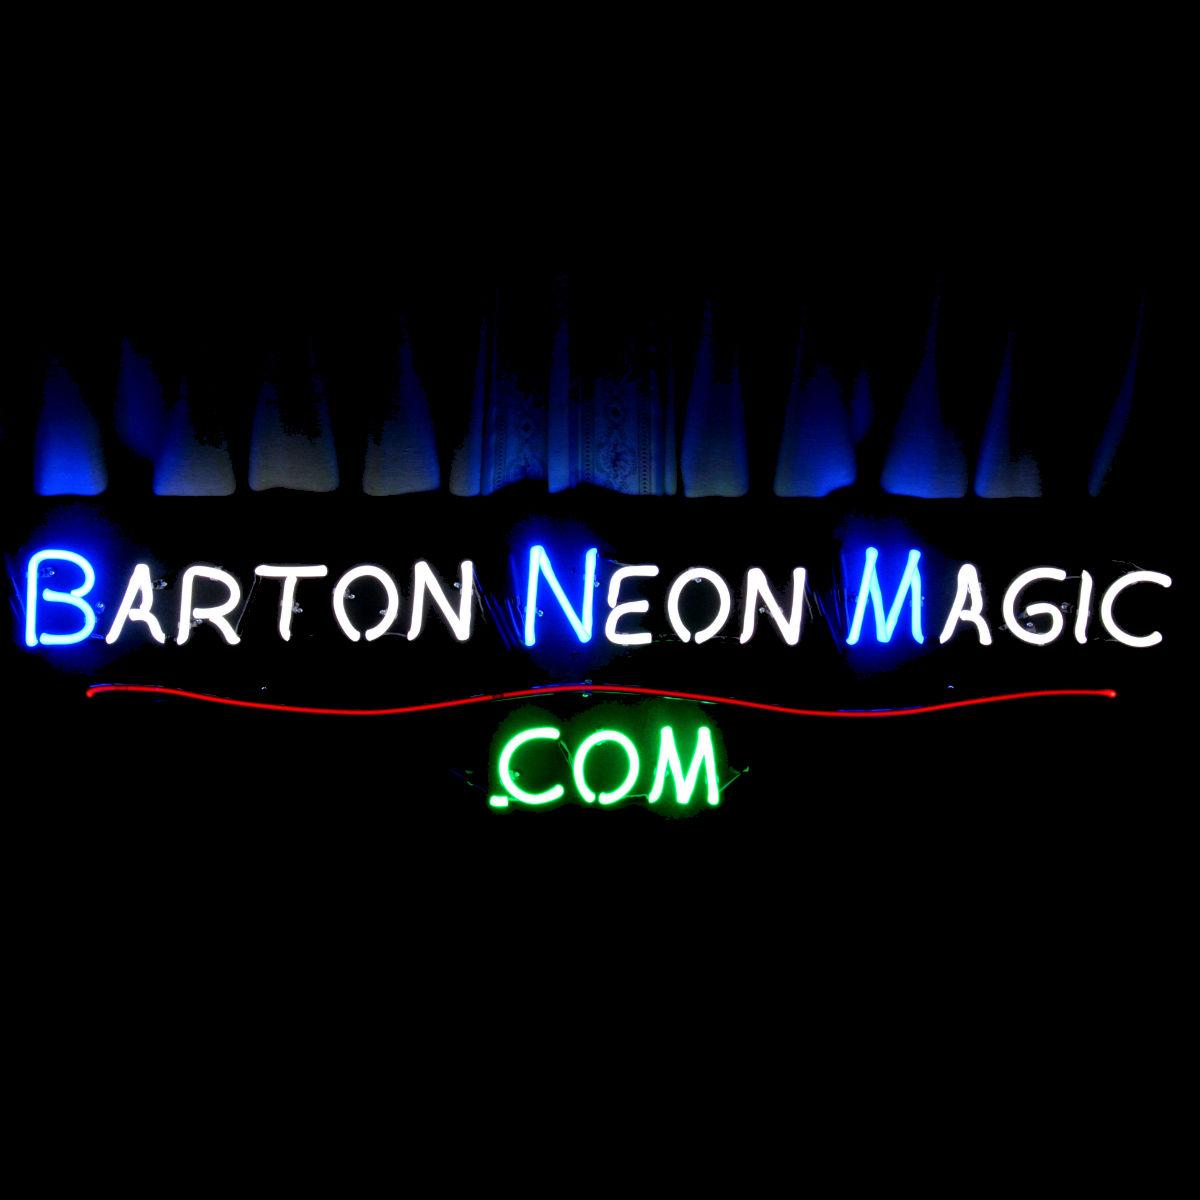 """BLUE NOTES"" Neon Light Artwork - by John Barton - BartonNeonMagic.com"